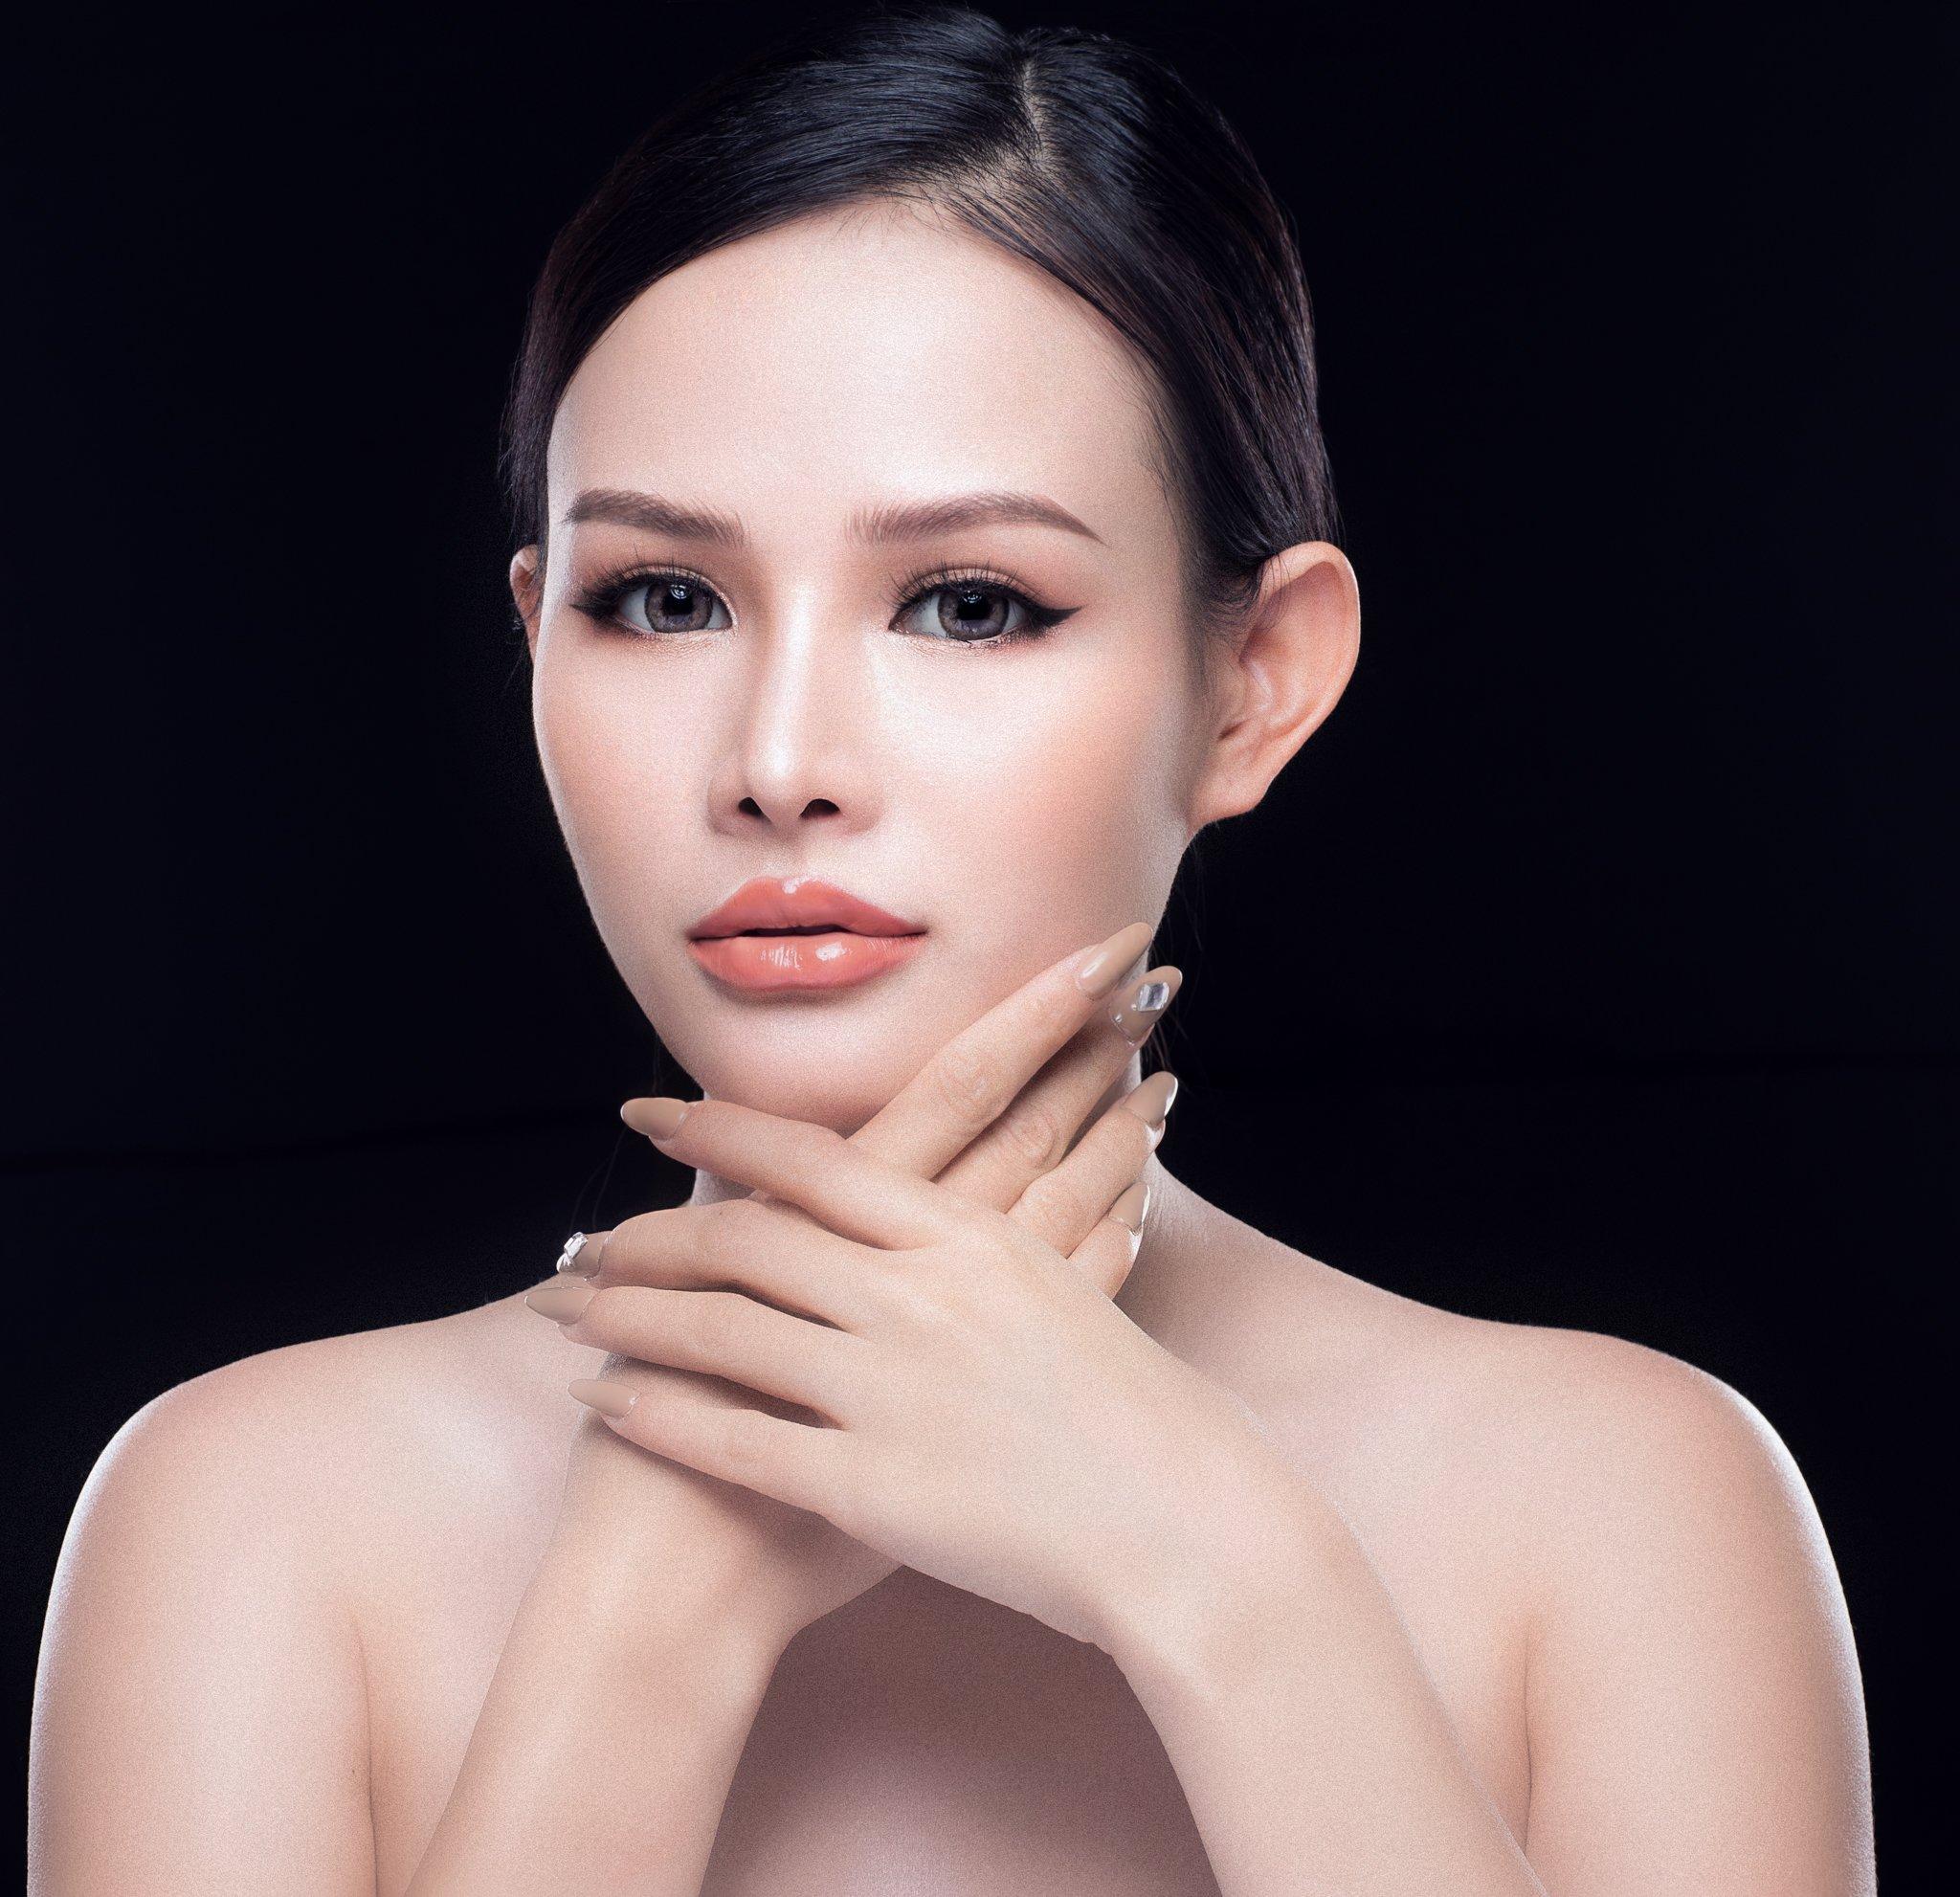 vietnam, Nguyễn Tấn Tuấn